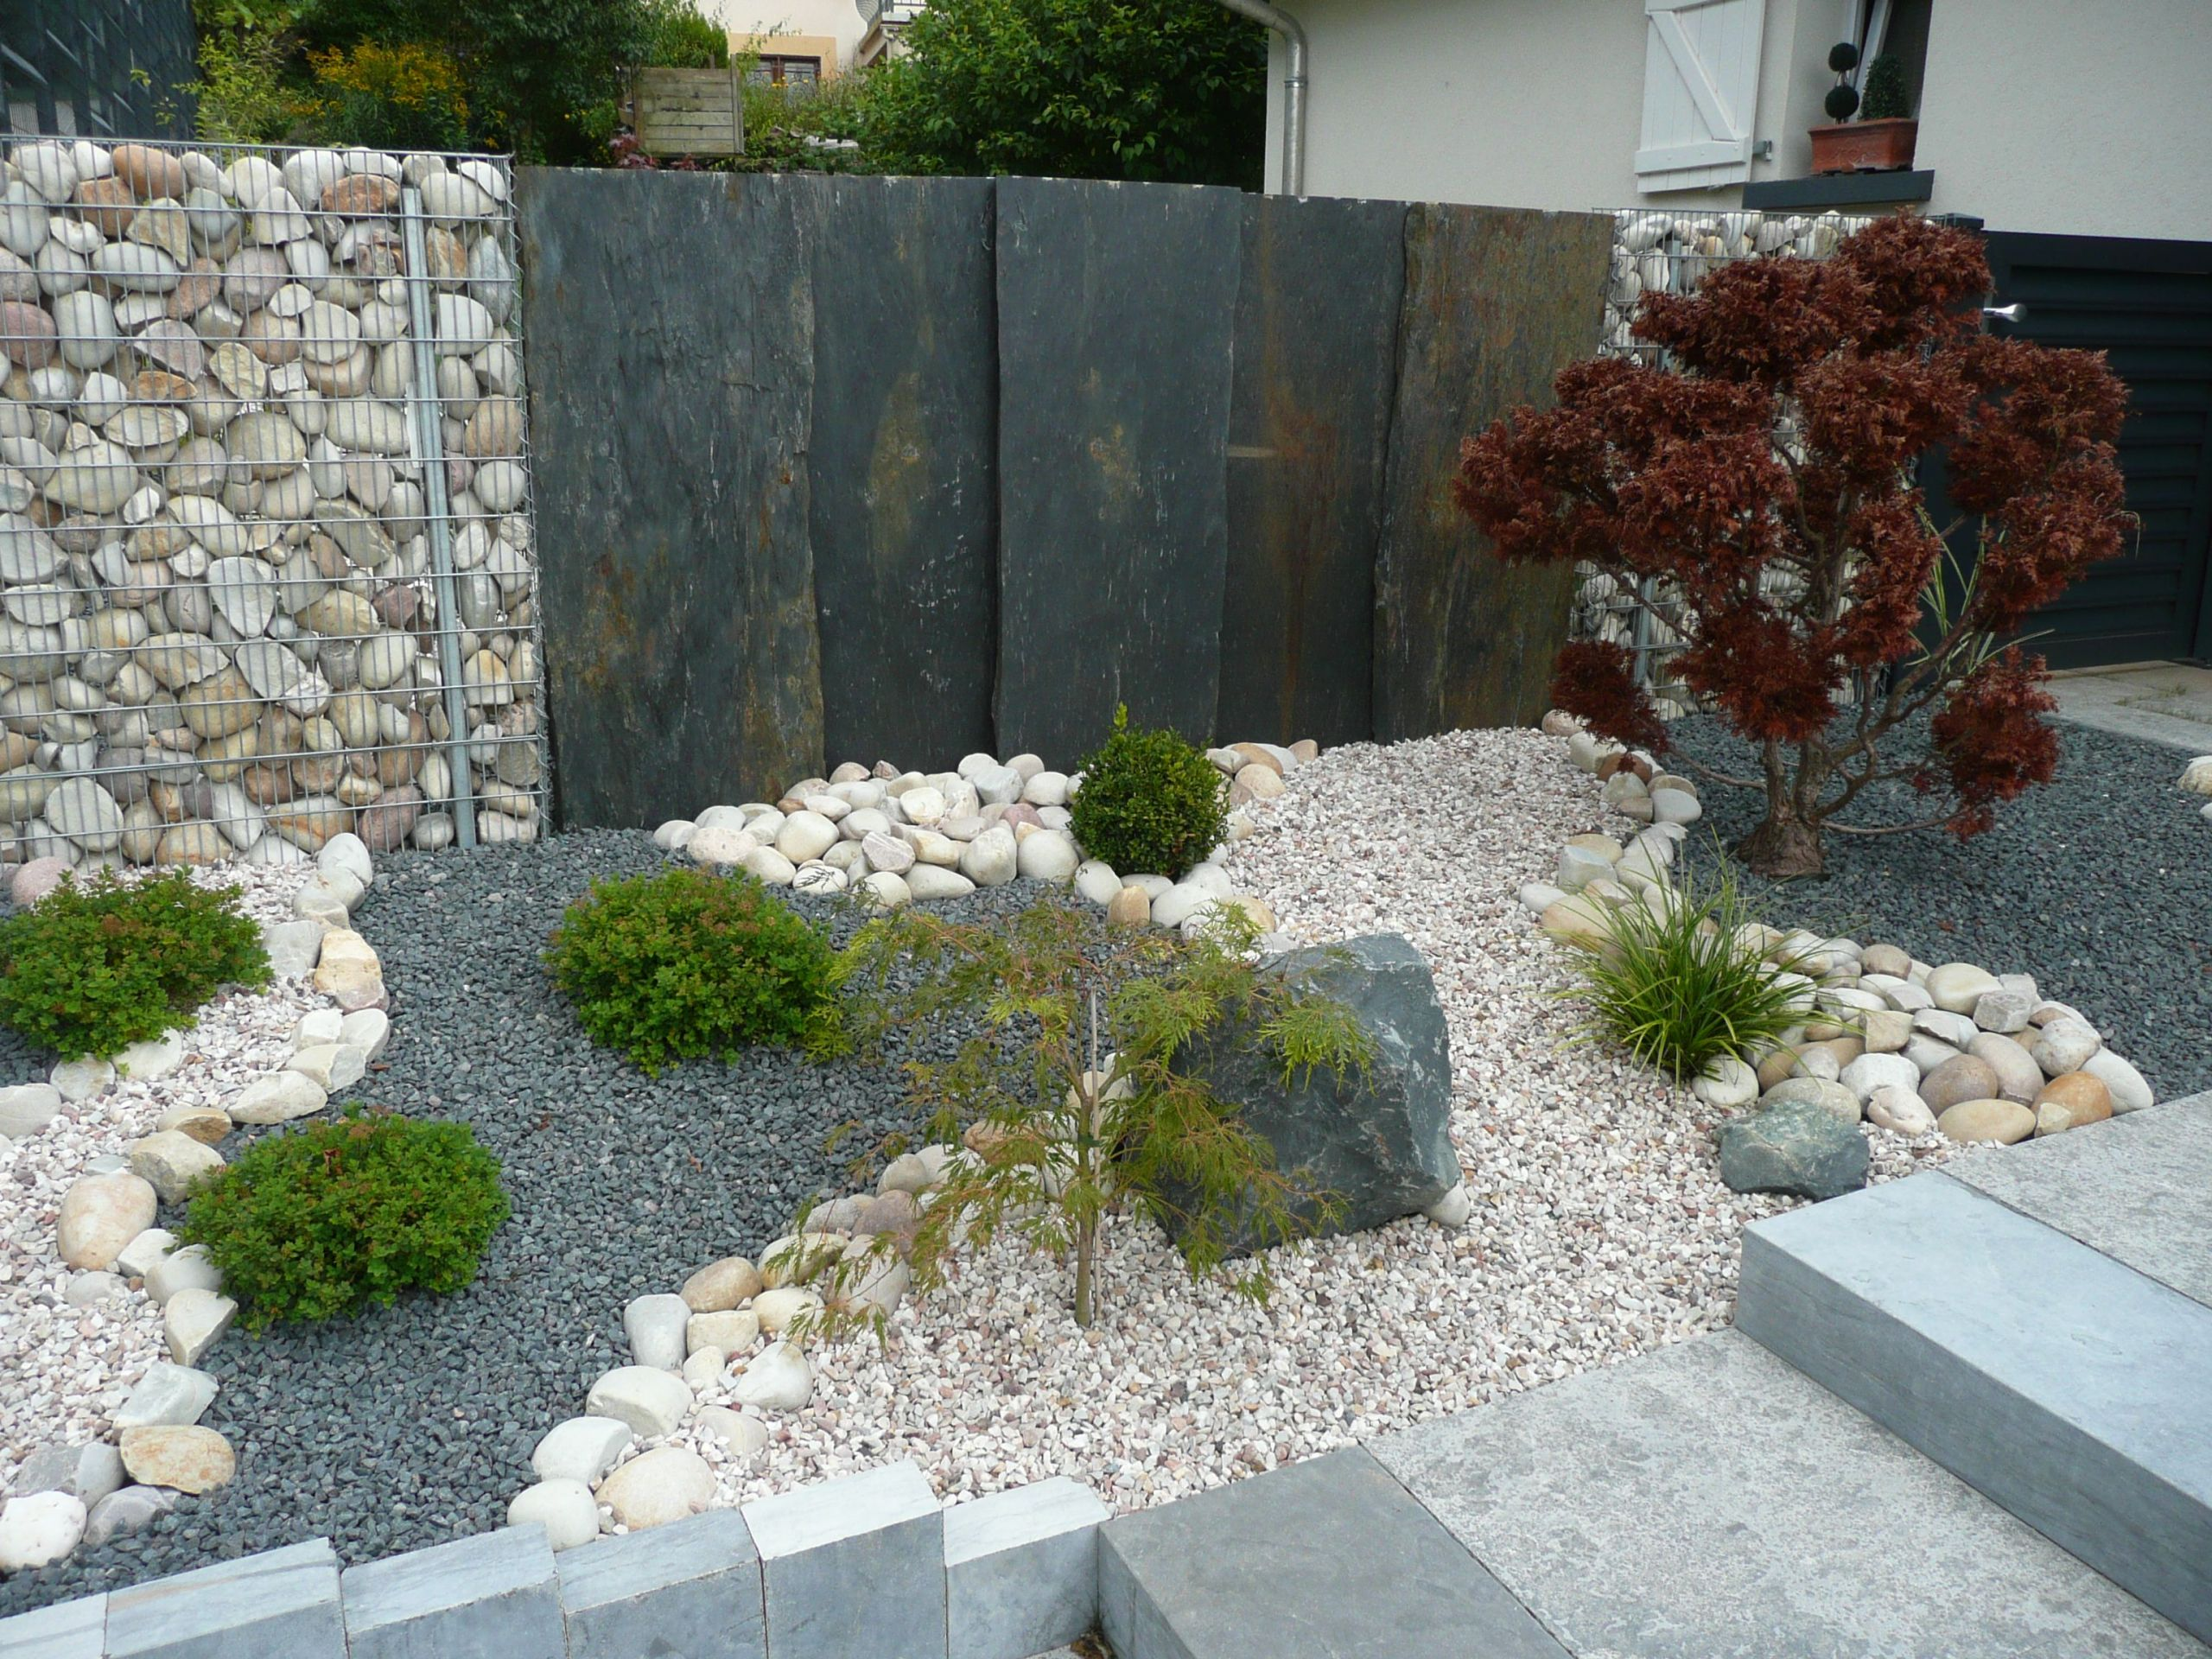 Jardin Mineral Zen Photo jardin zen sec jardin minéral et végétal jardin minéral